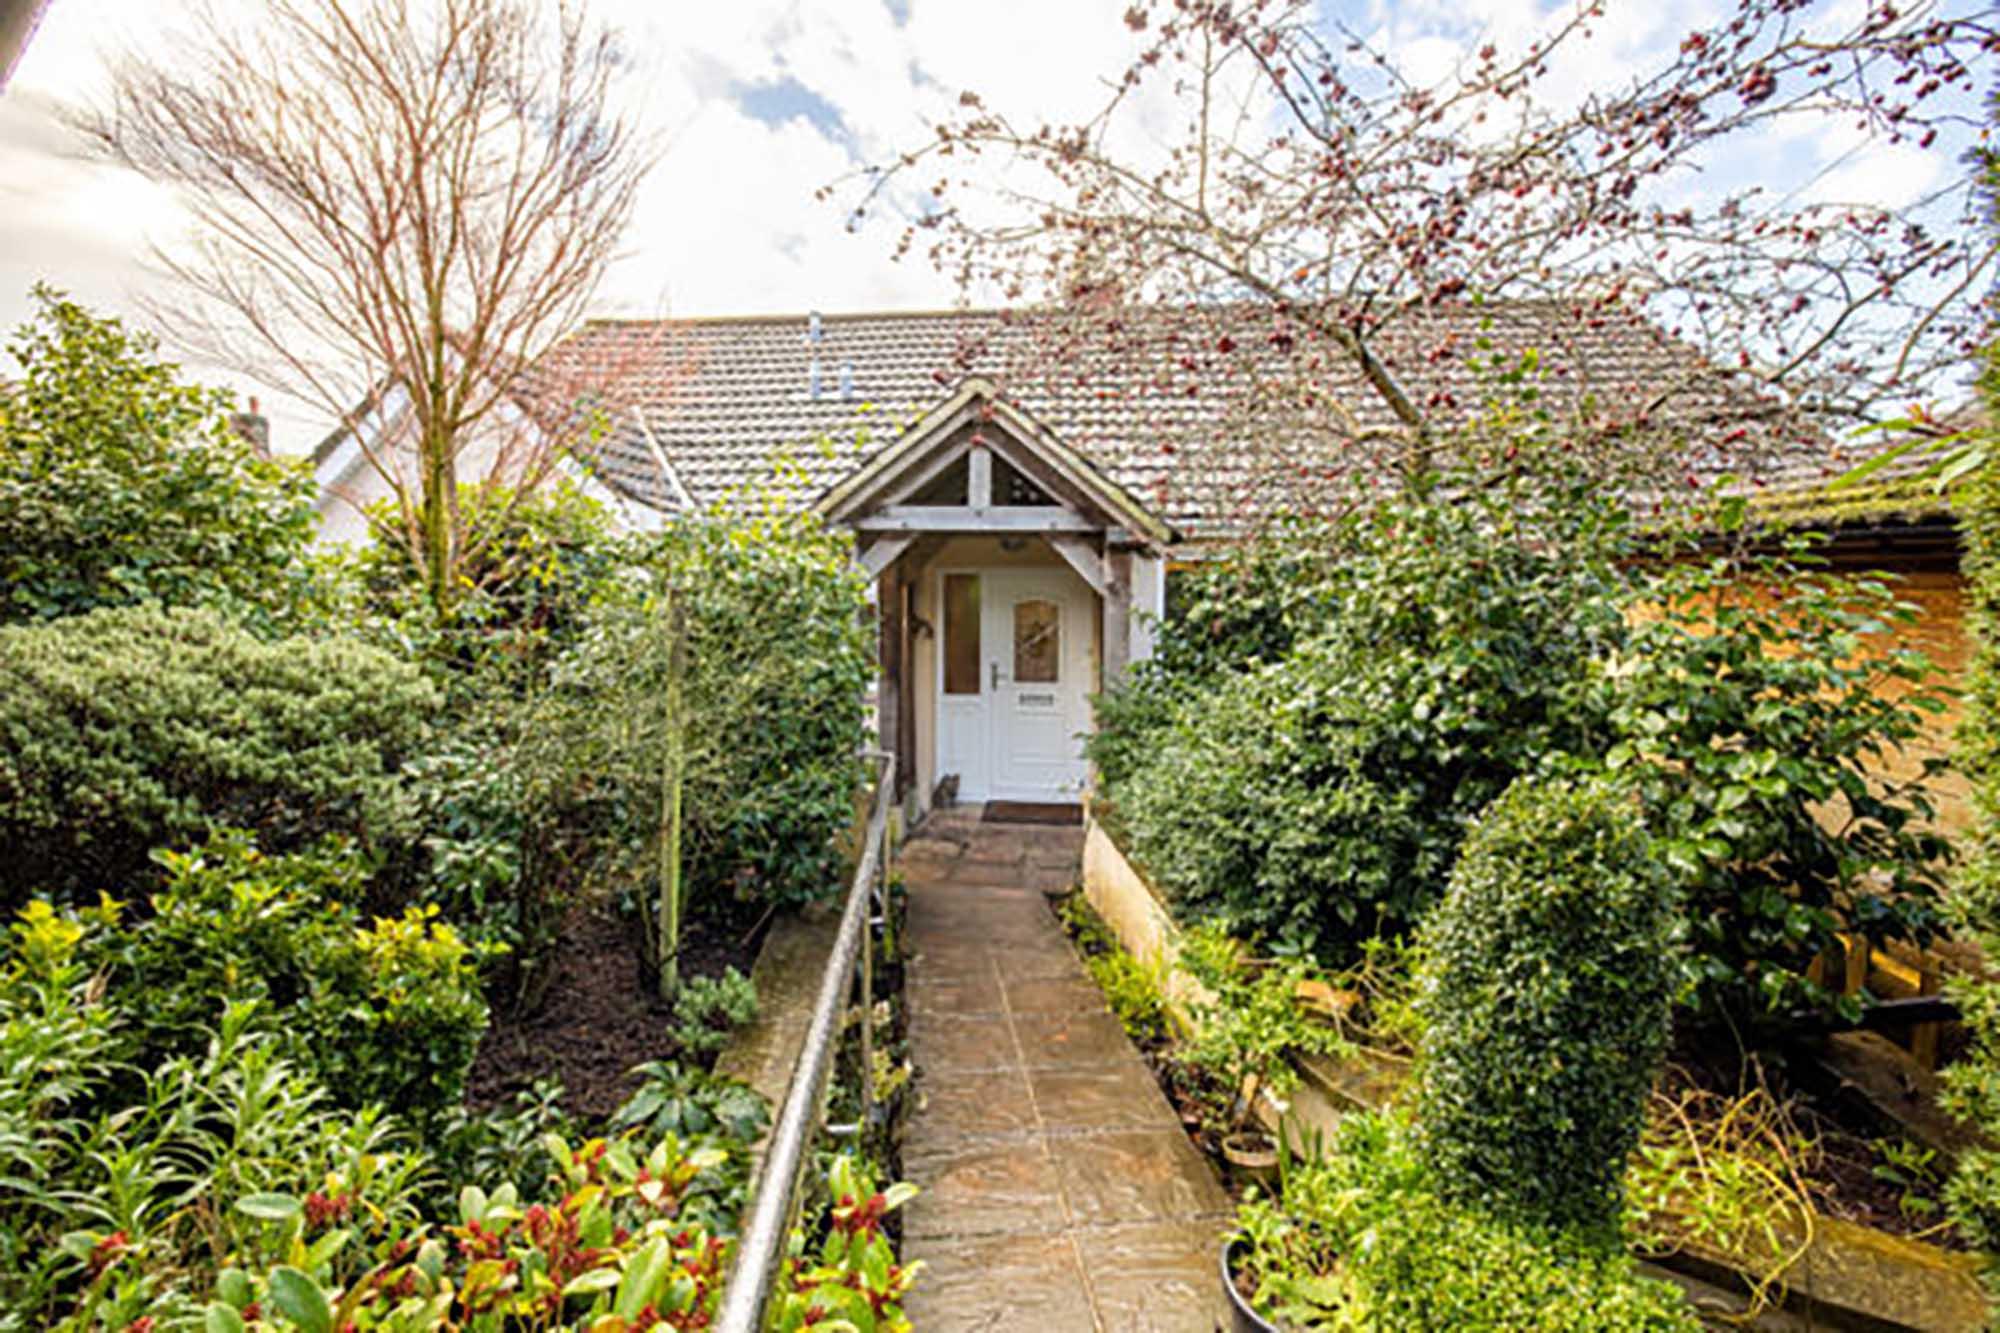 Lovely light filled home in Croscombe, Wells